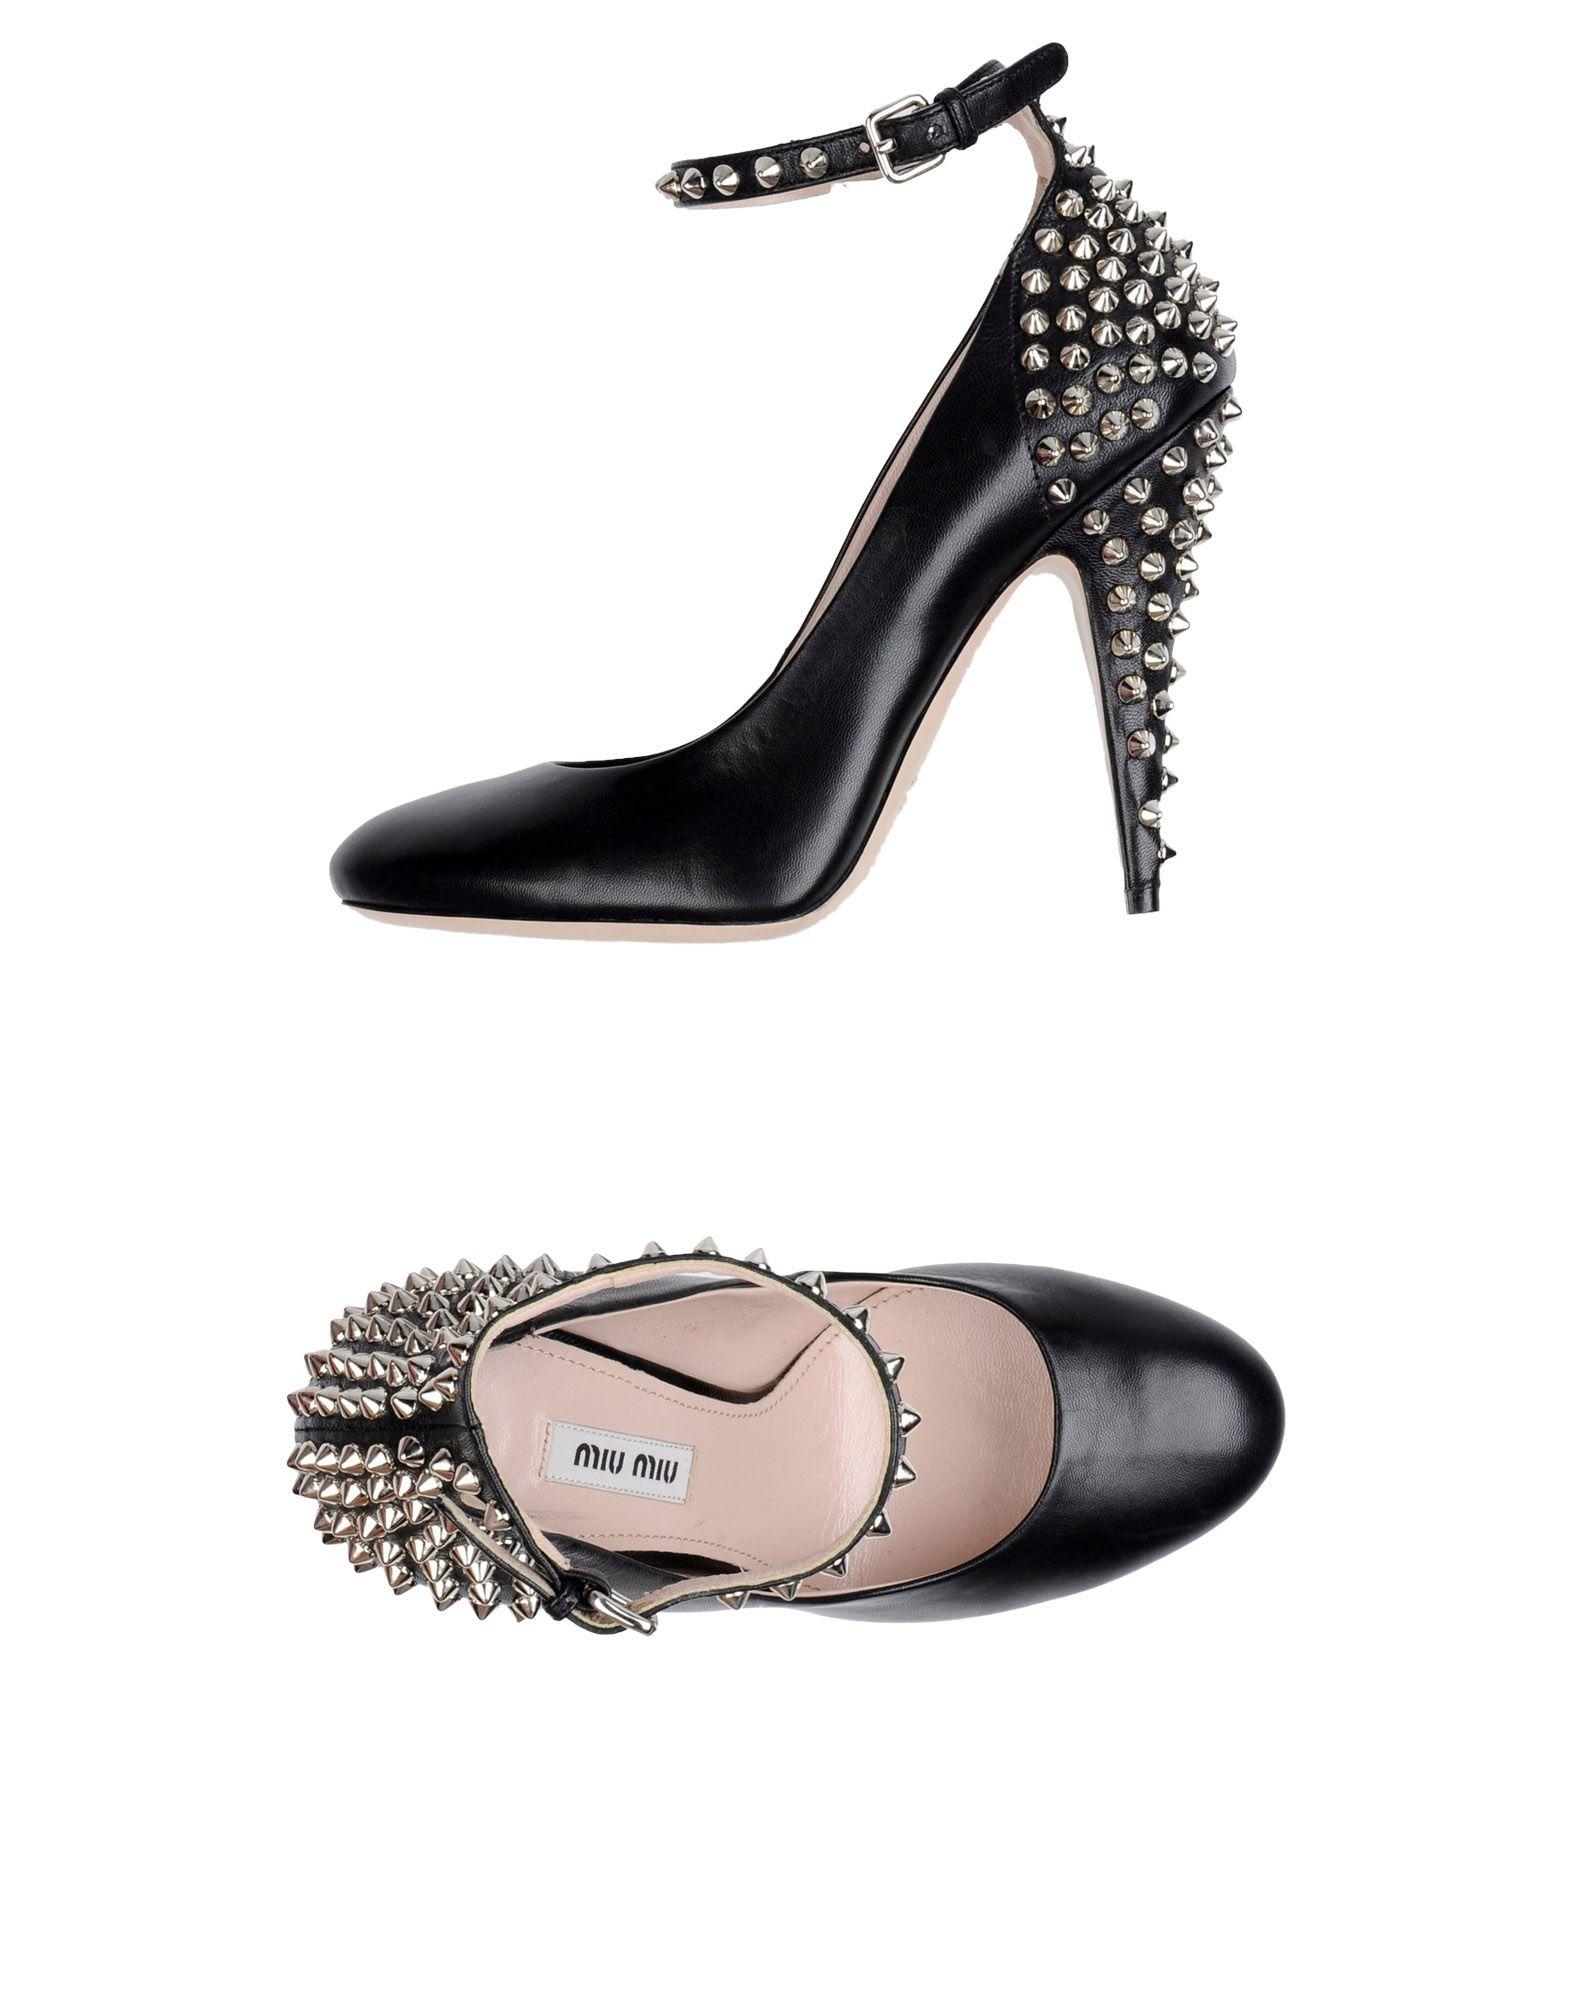 Miu Miu Pumps aussehende Damen  11236211KHGünstige gut aussehende Pumps Schuhe 75d26f